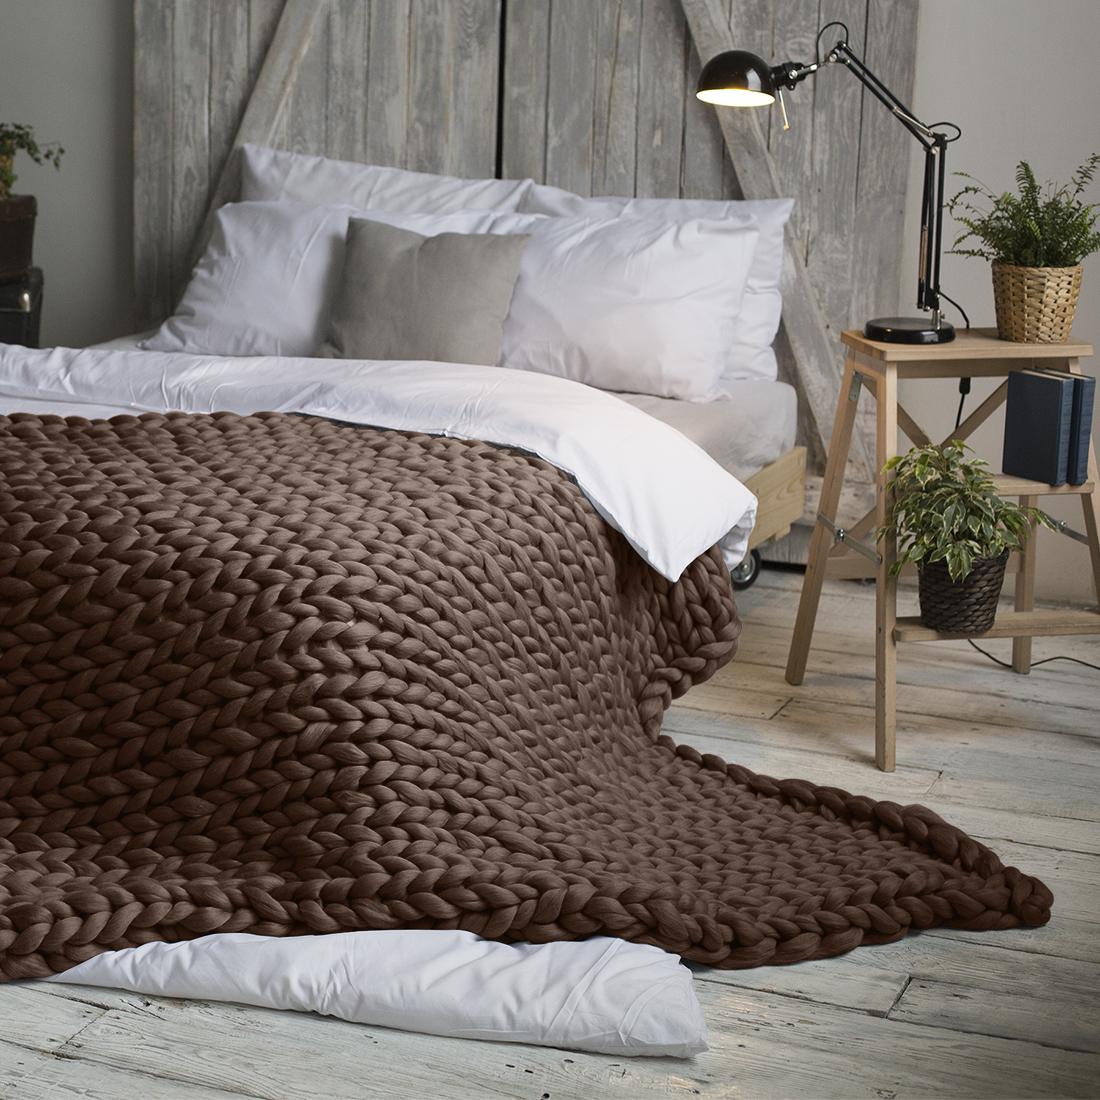 Плед Dome Hygge, цвет: шоколадный, 140 см х 200 см fit 10618